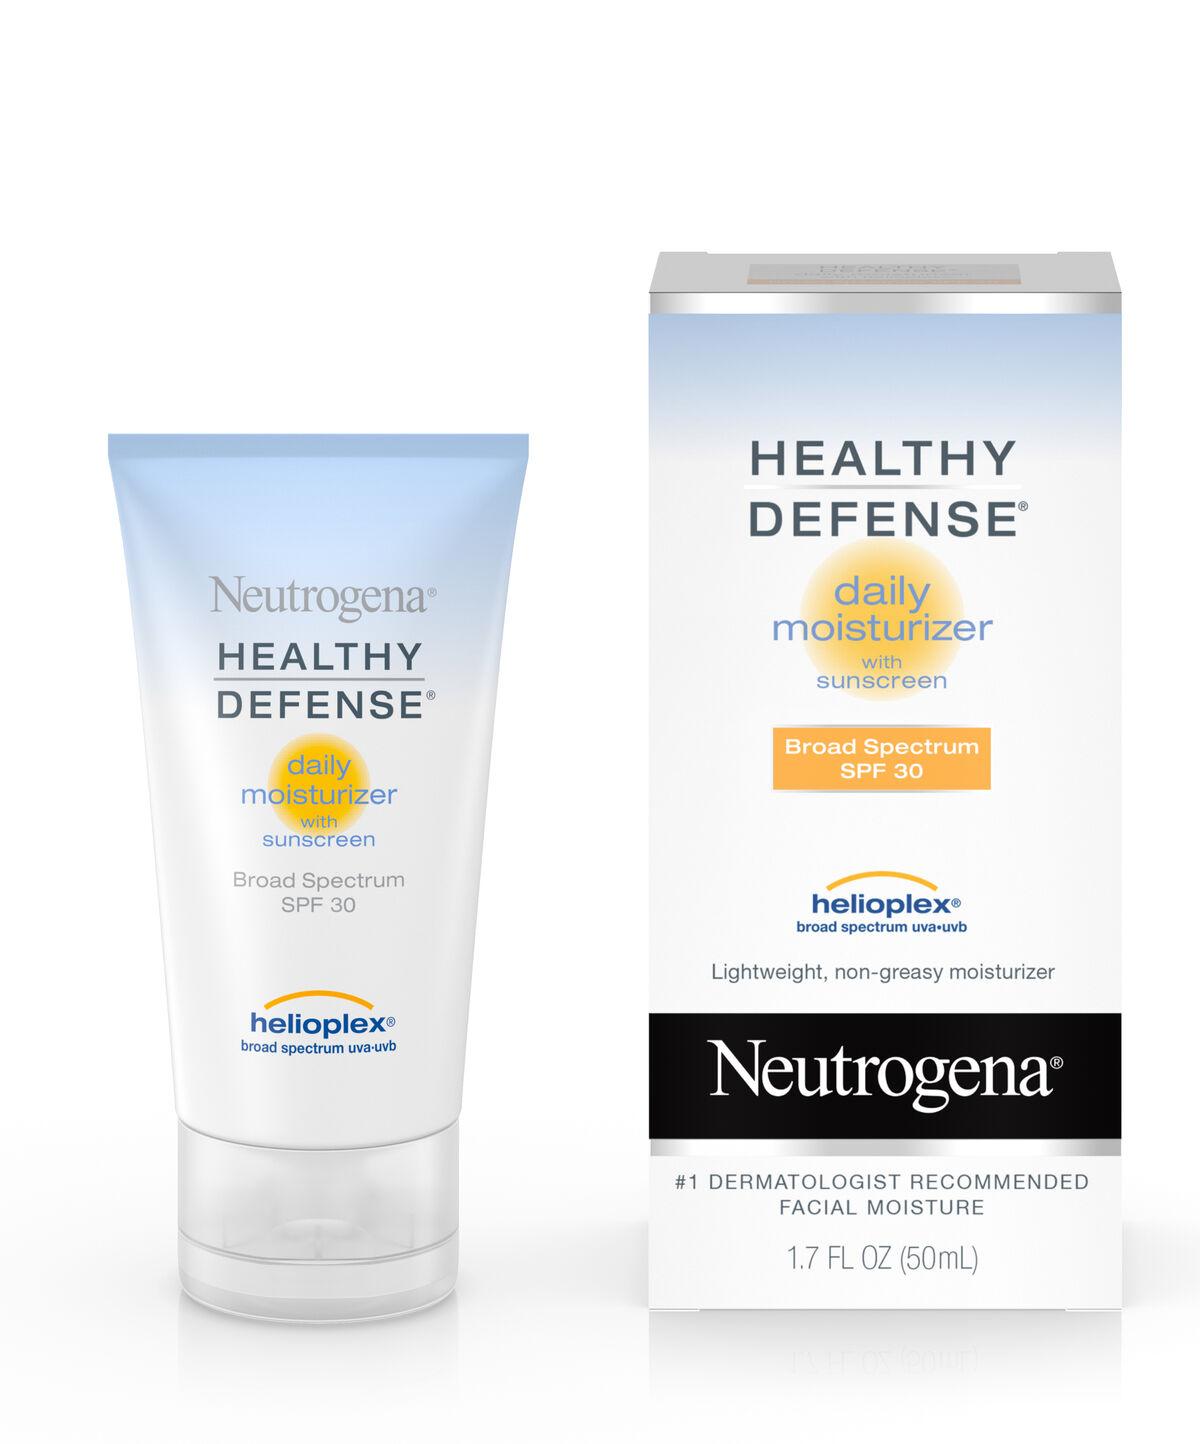 Neutrogena healthy defense SPF 30